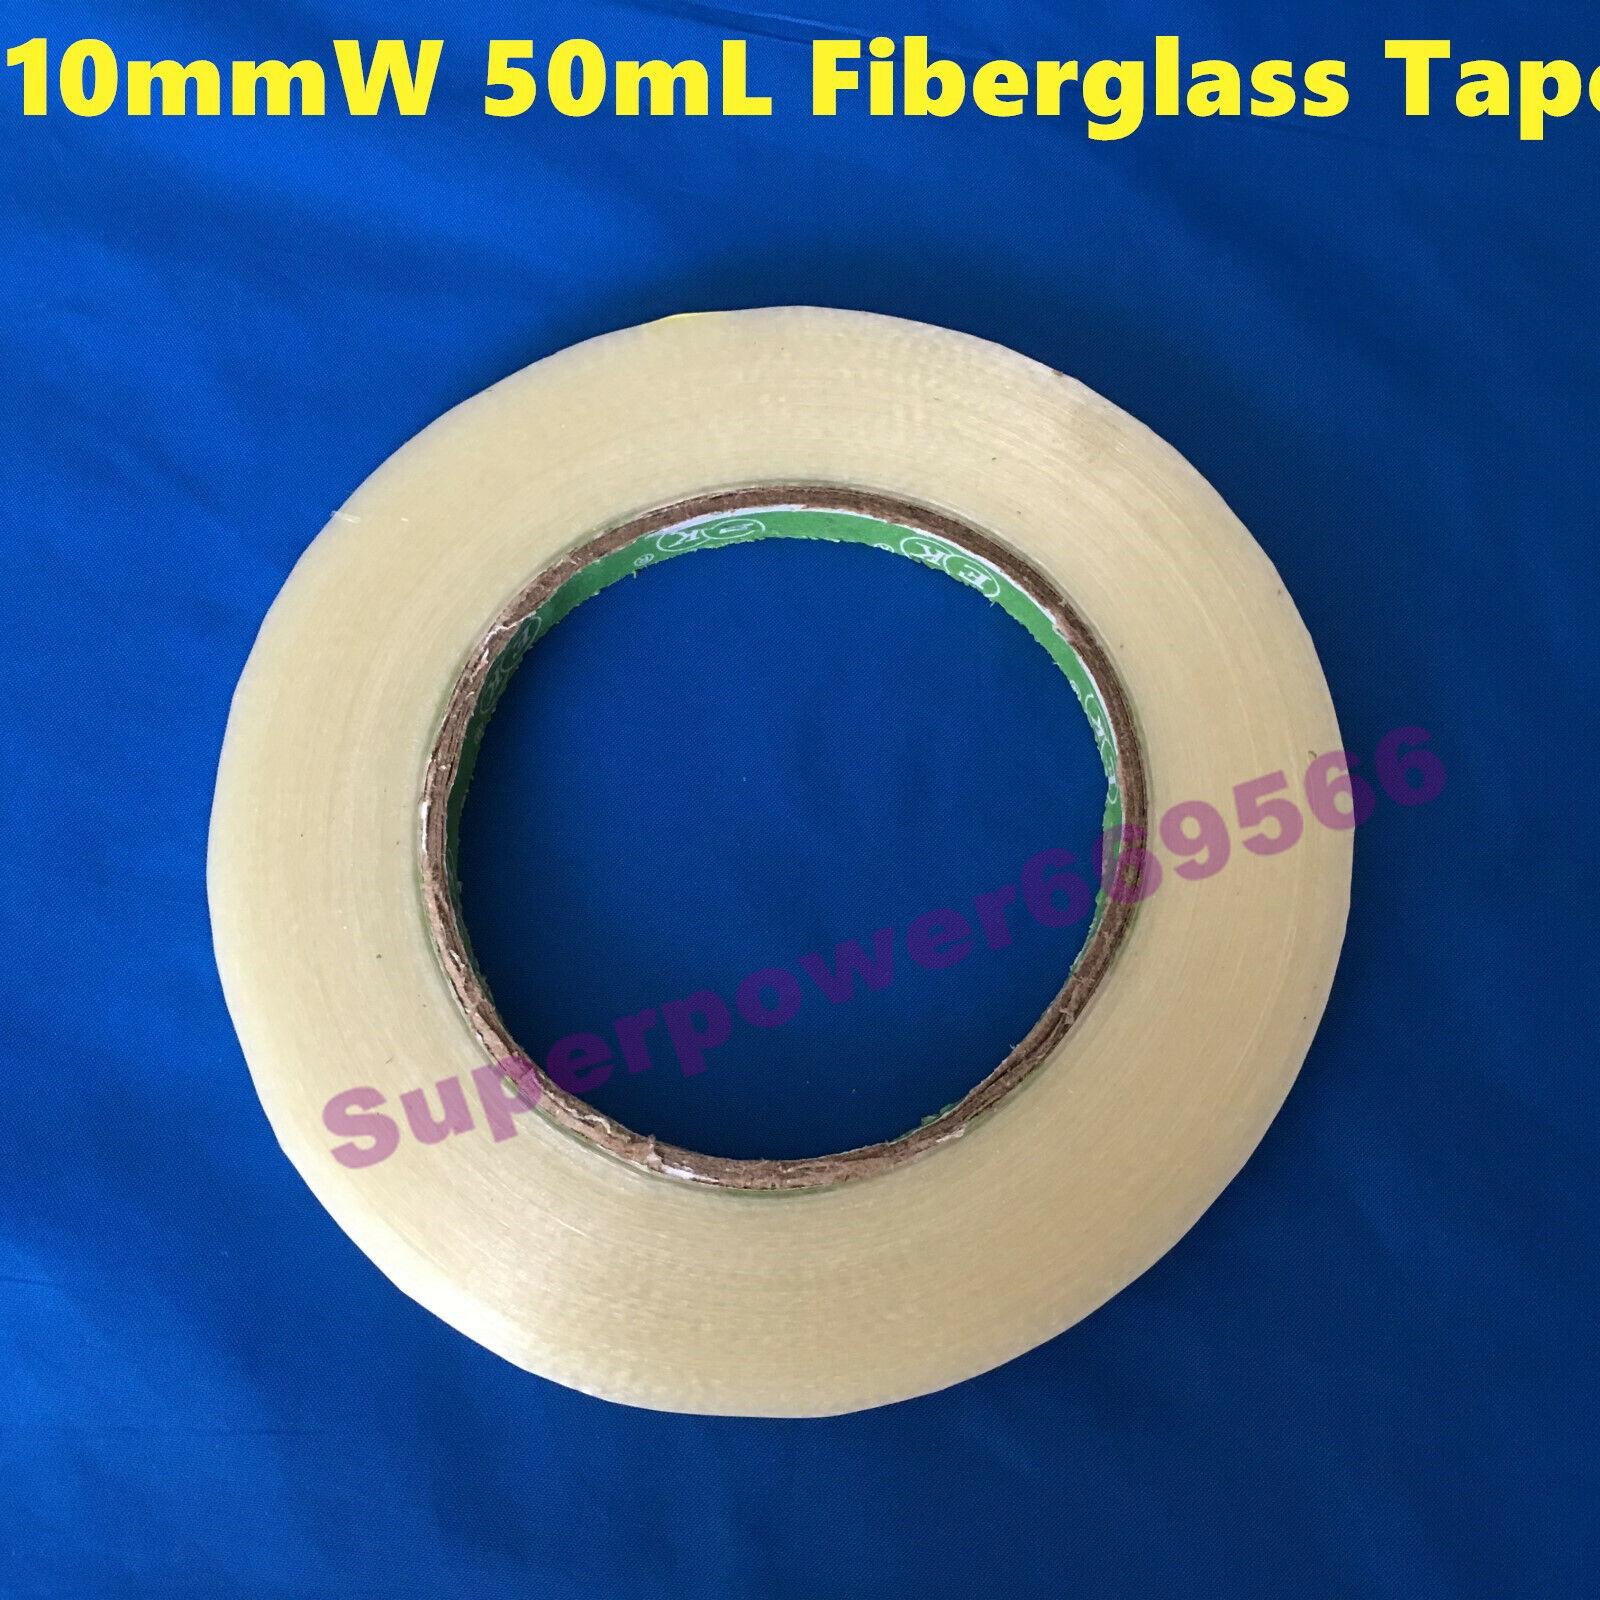 10mm W fiberglass adhesive tape model airplane battery high strength singleside